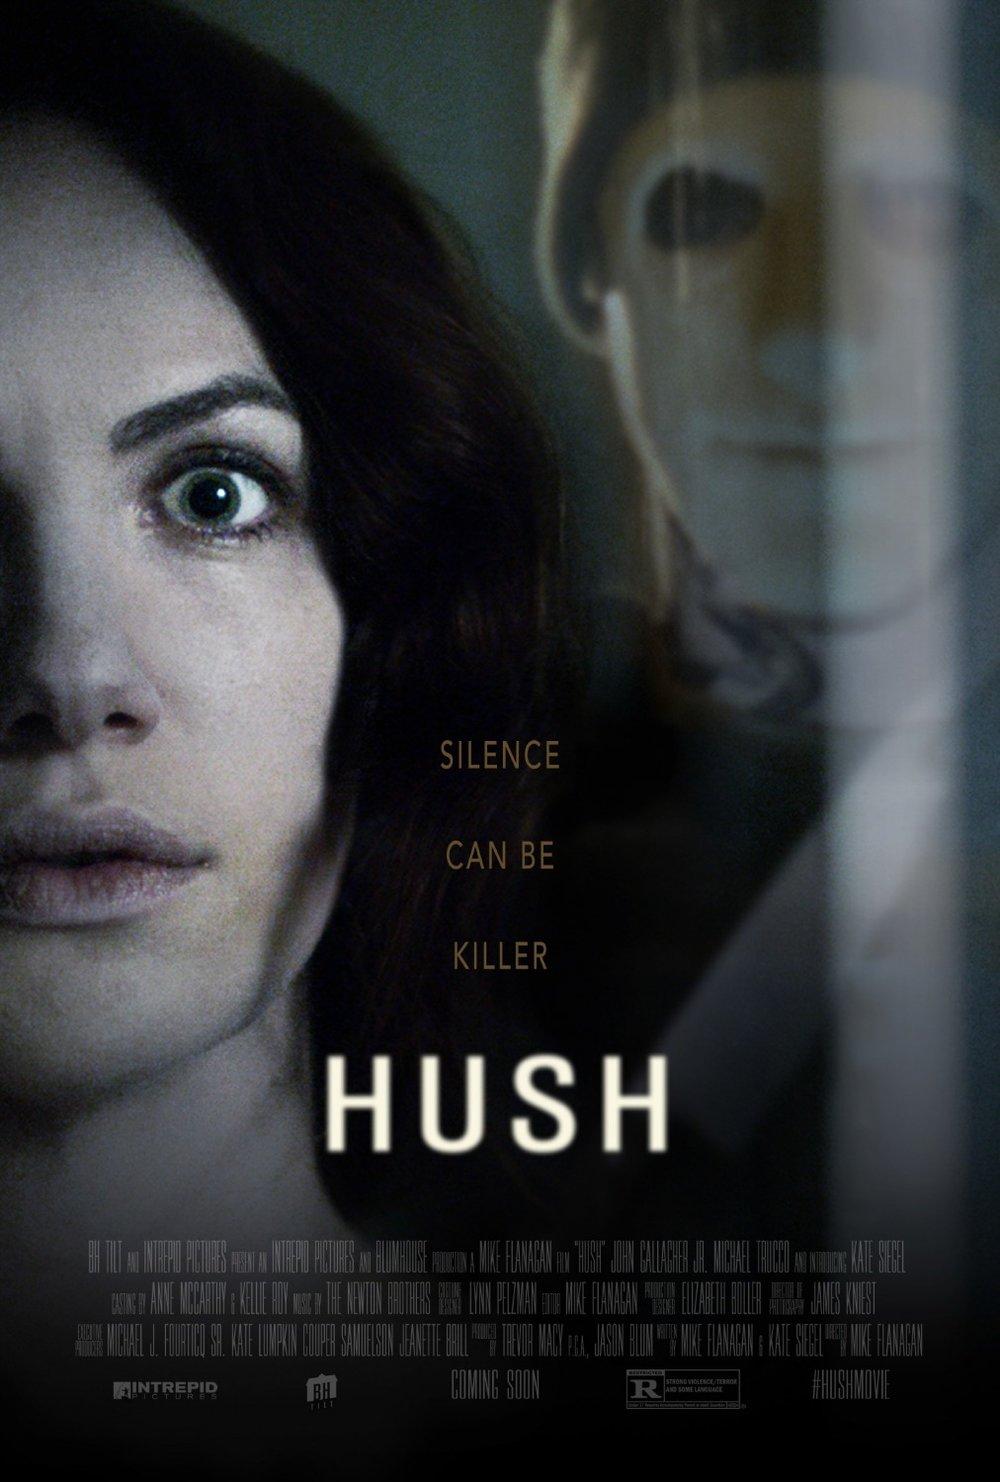 hush_xlg.jpg